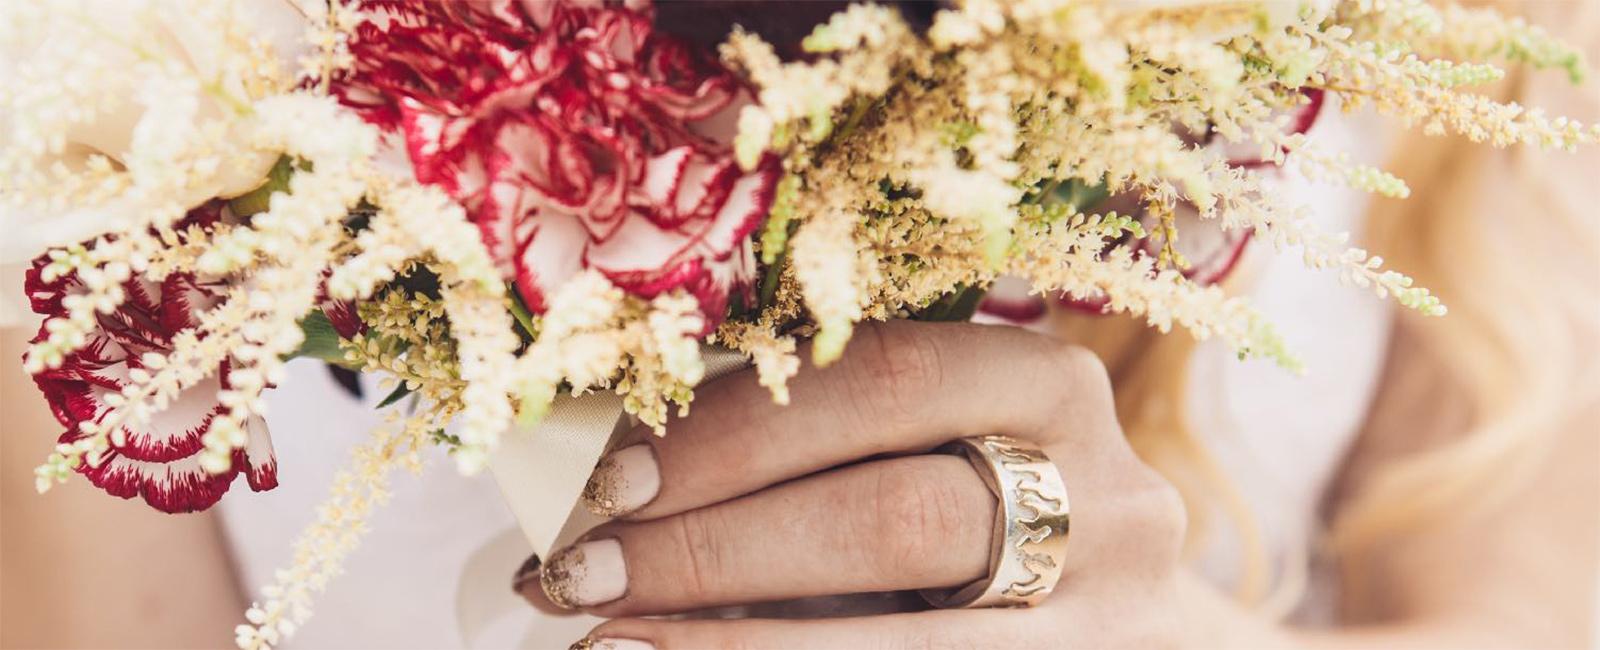 Brautstrauss mit Ehering